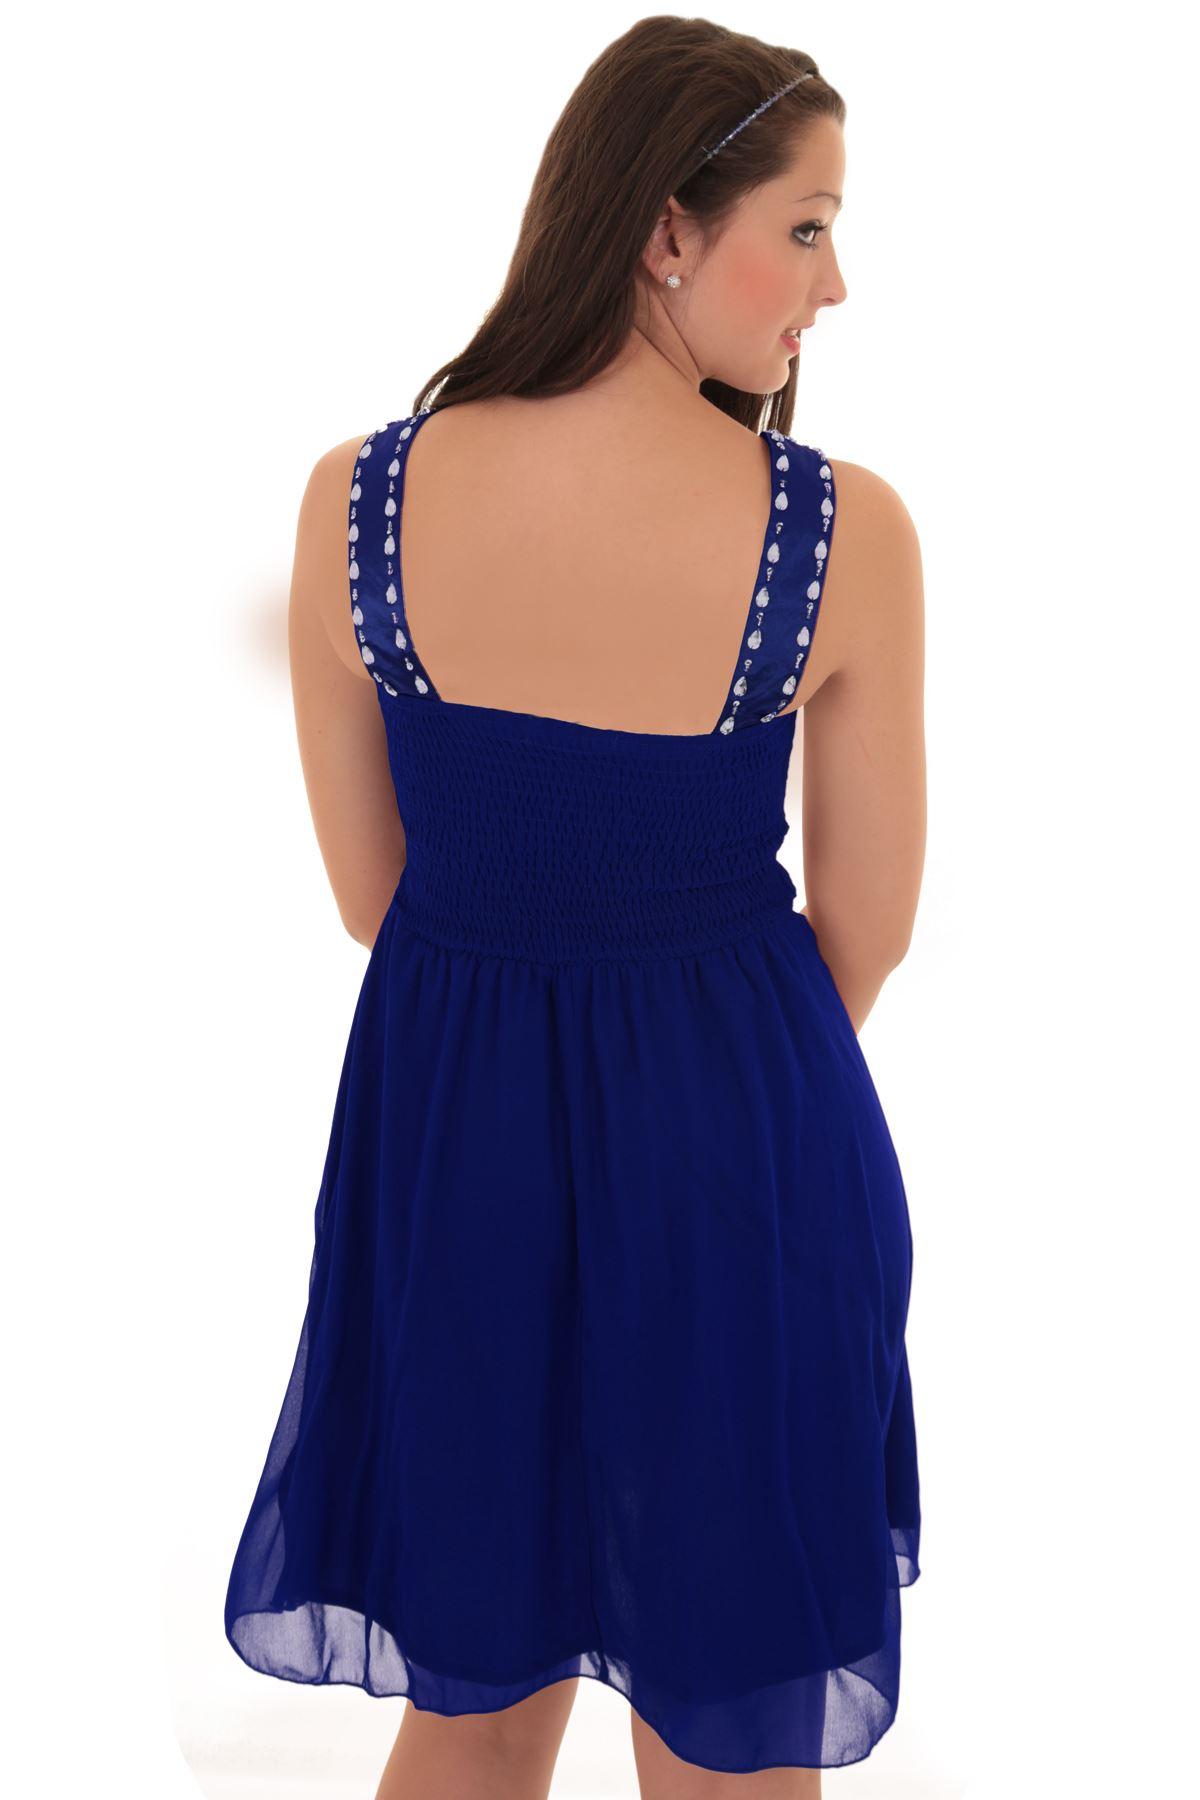 Ladies Sleeveless Diamante V Neck Padded Chiffon Pleated Flare Short Dress